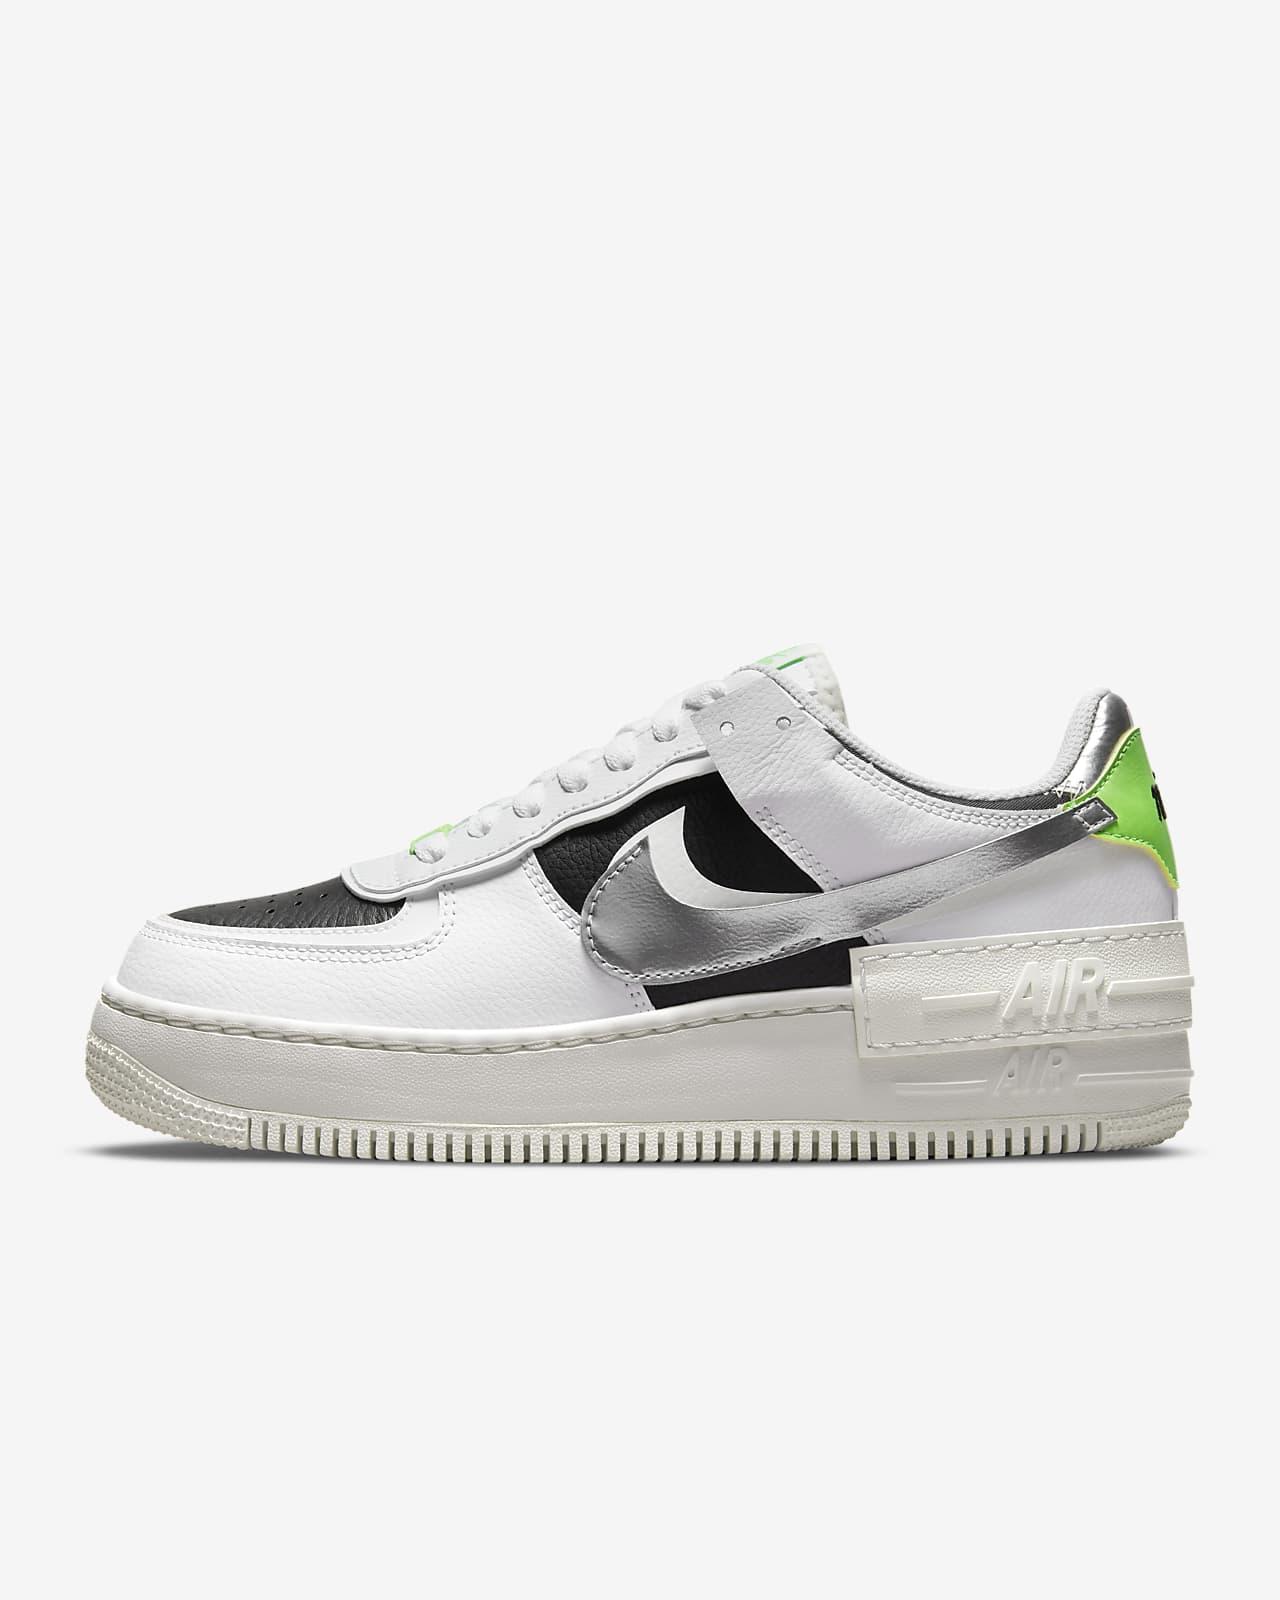 Chaussure Nike Air Force 1 Shadow pour Femme. Nike LU